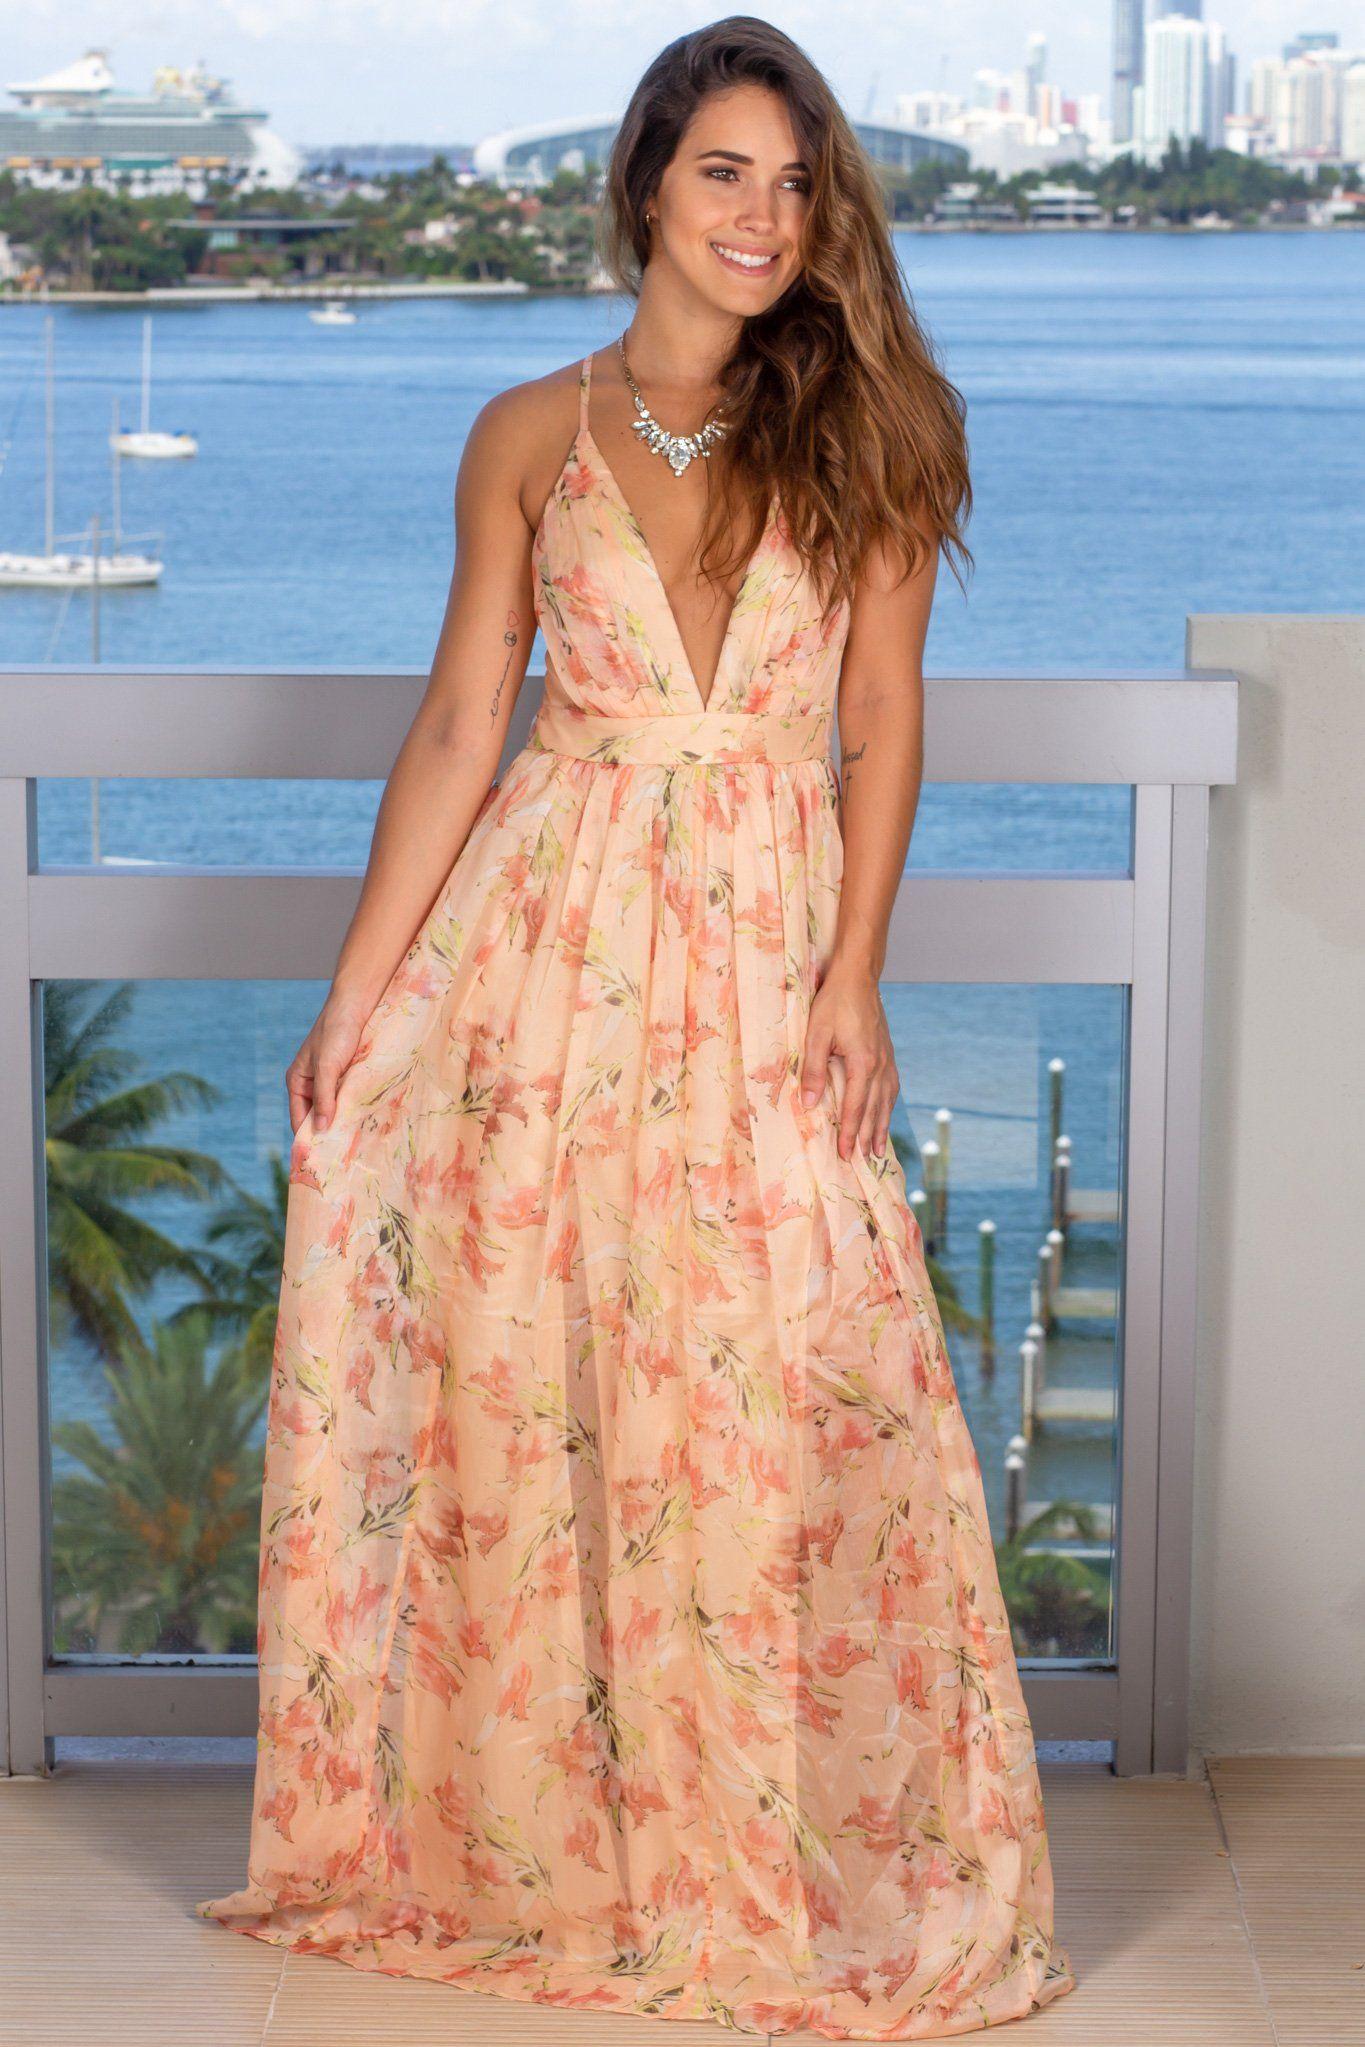 Peach Vintage Floral Maxi Dress Maxi Dress Dresses Floral Maxi Dress [ 2047 x 1365 Pixel ]